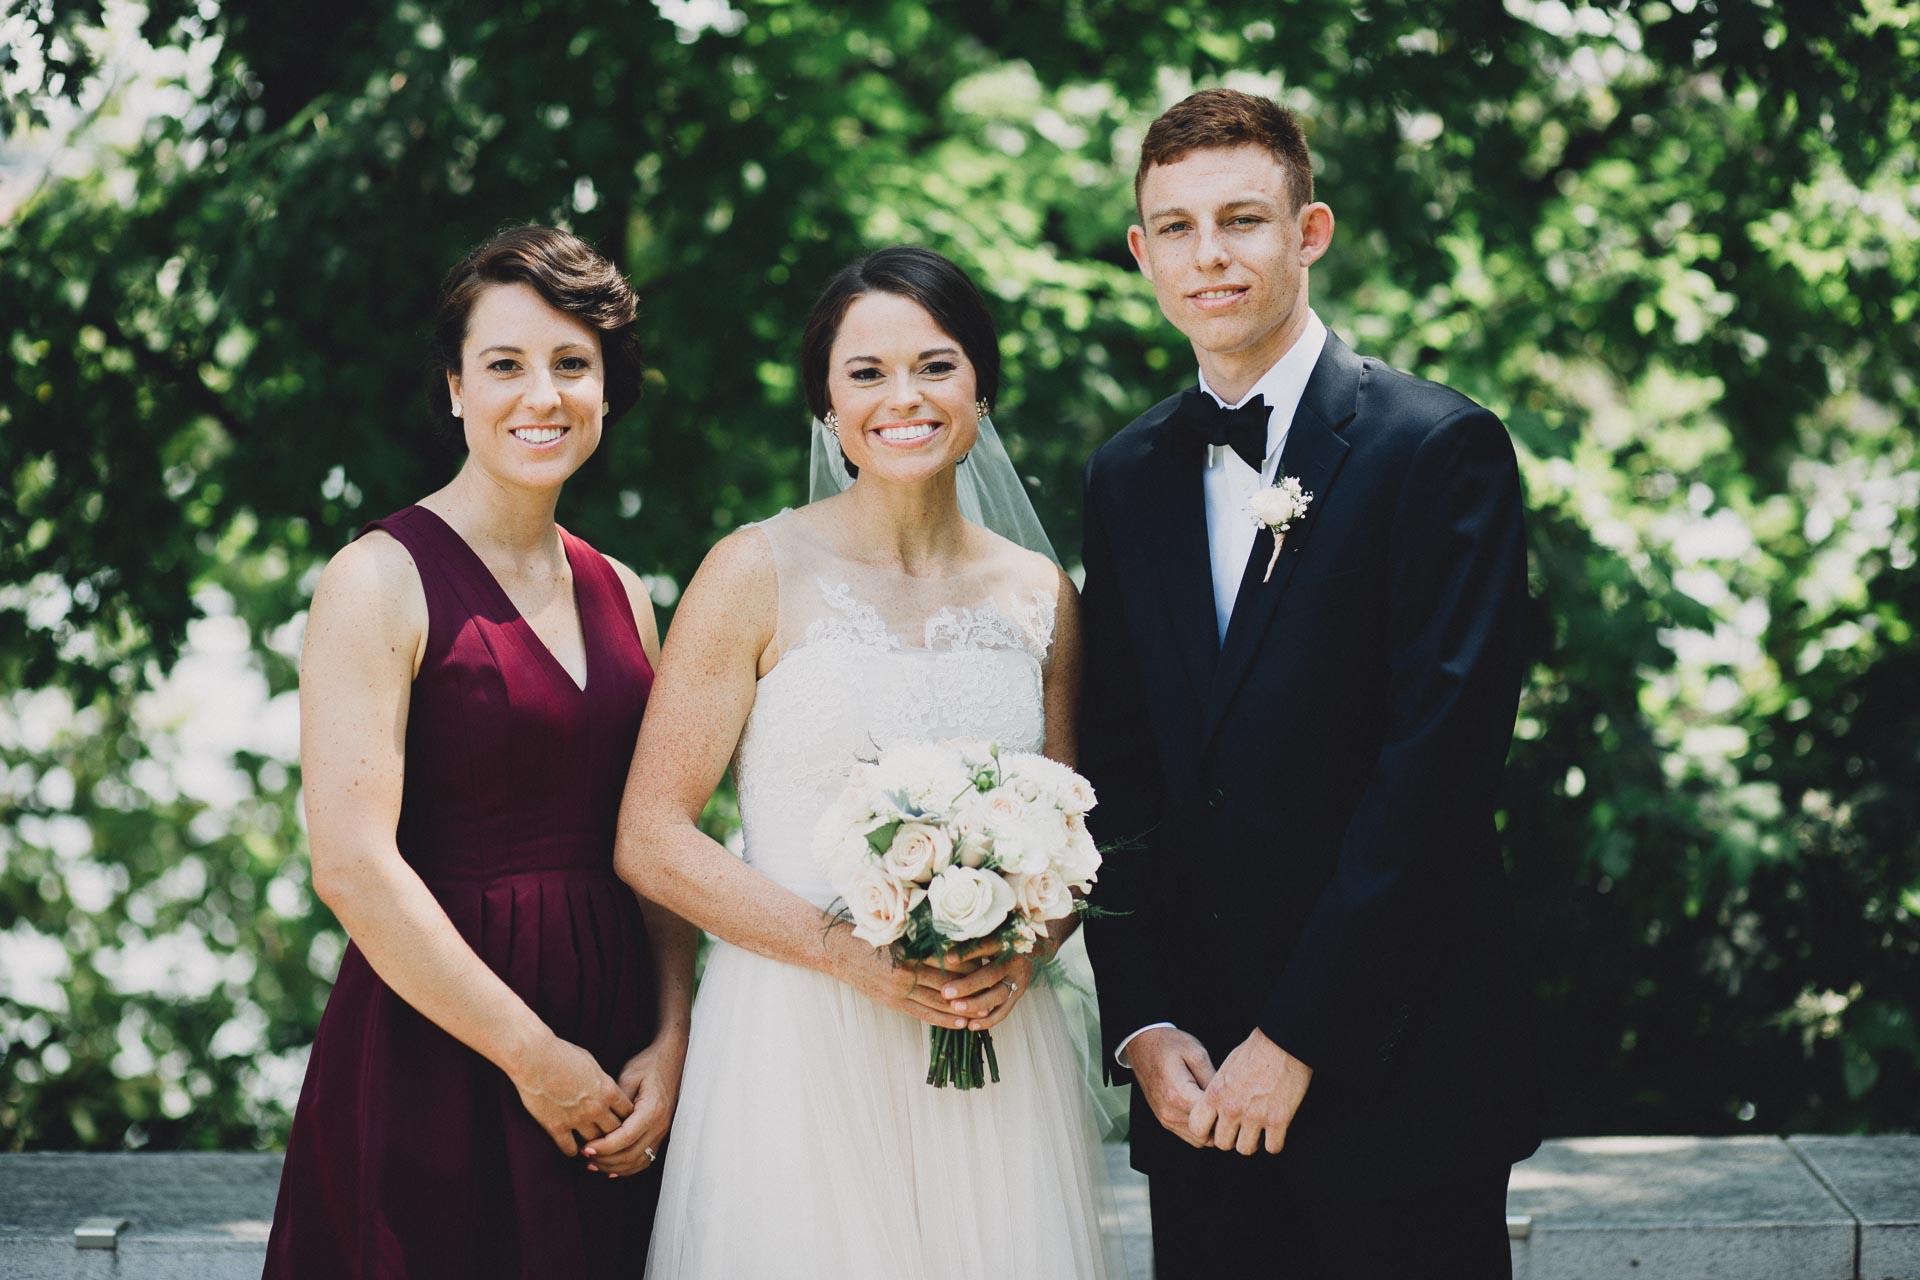 Emily-Eddie-Cincinnati-Rennaissance-Hotel-Wedding-037@2x.jpg